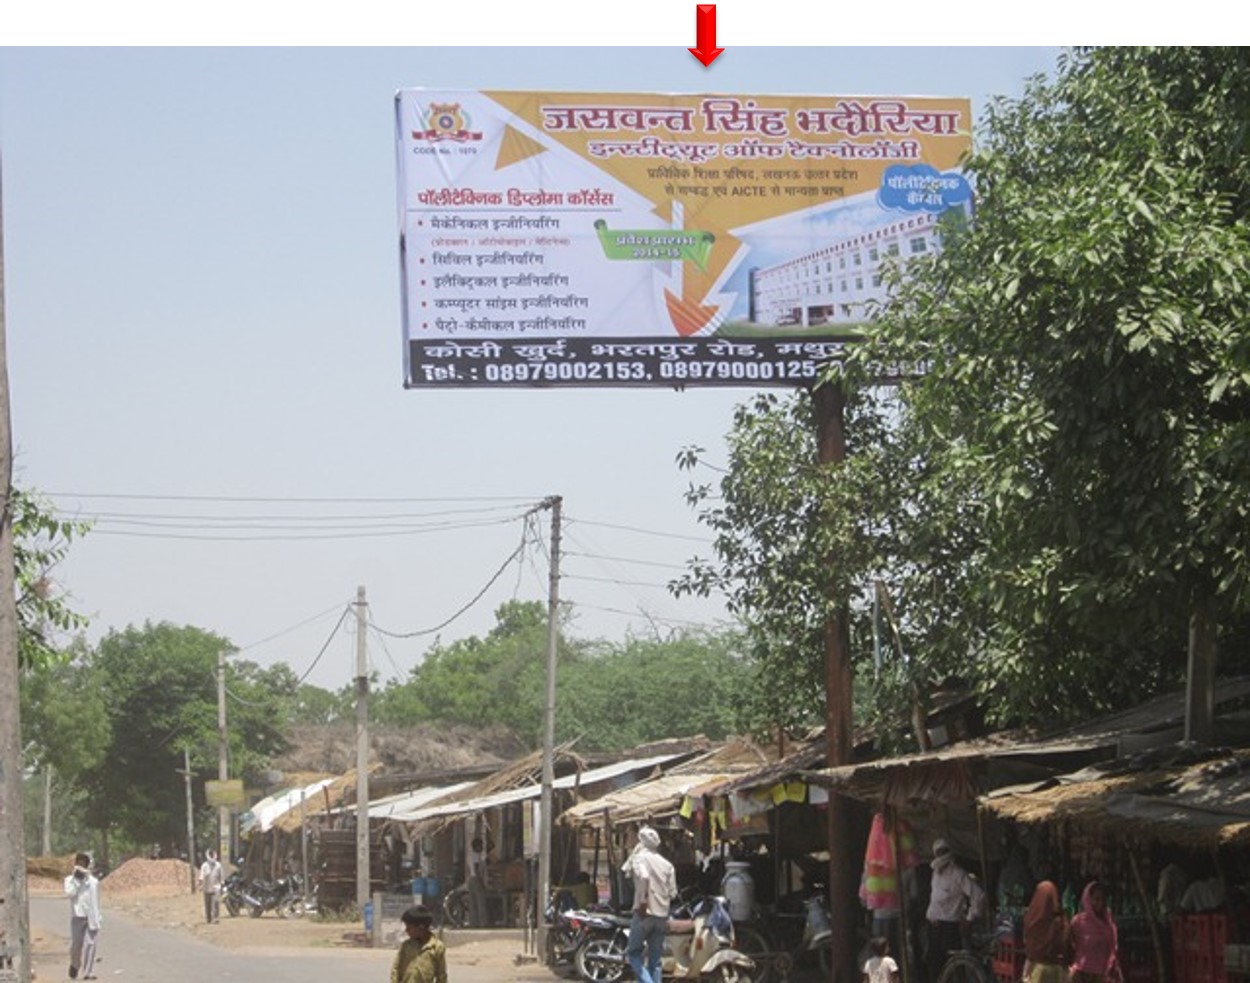 Fariha Road Pratappur, Shikohabad